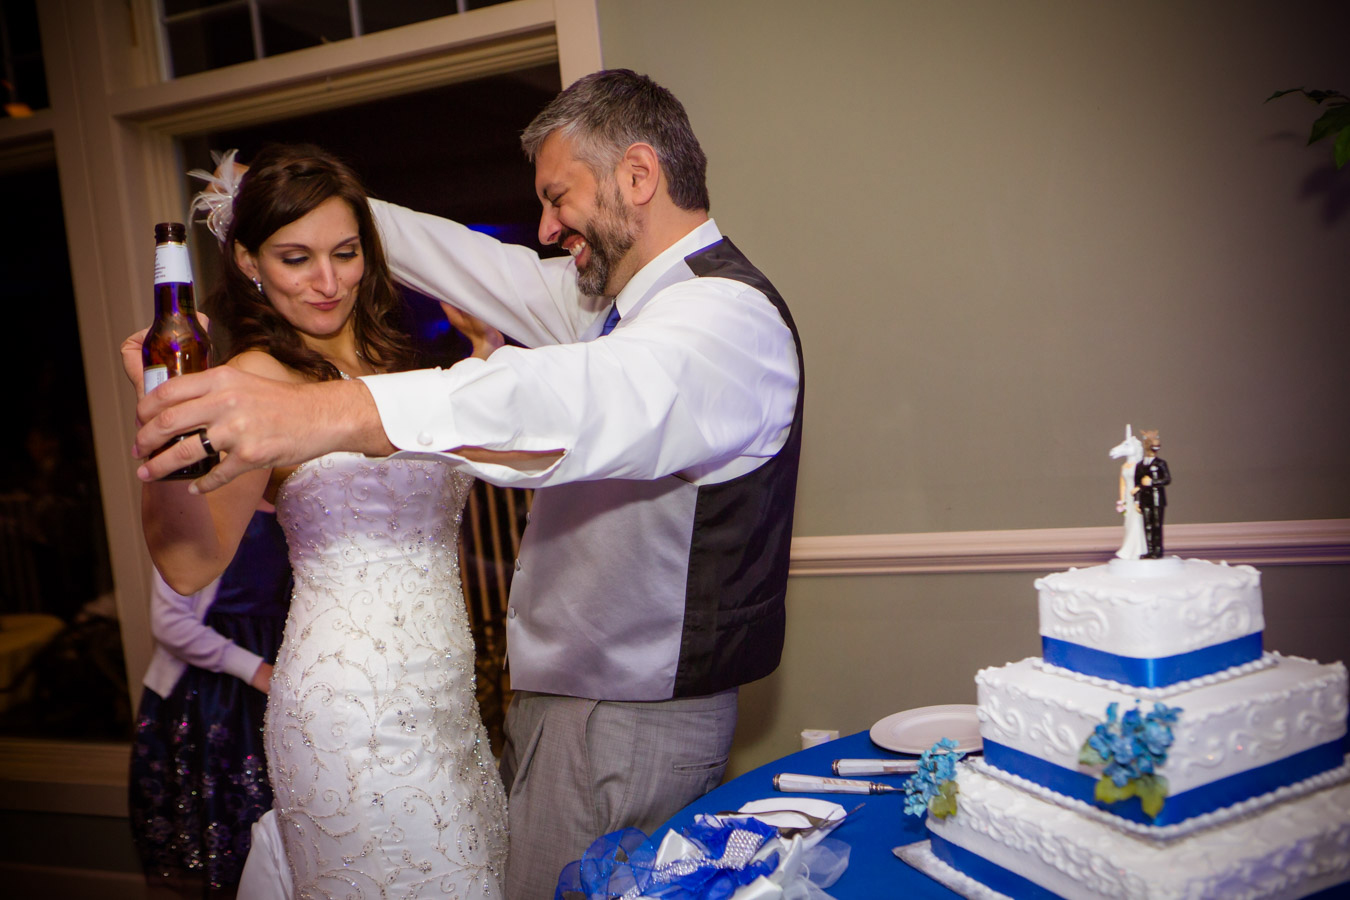 NEPA_Pocono_Weddings_Rob_Lettieri_Photography_16.jpg